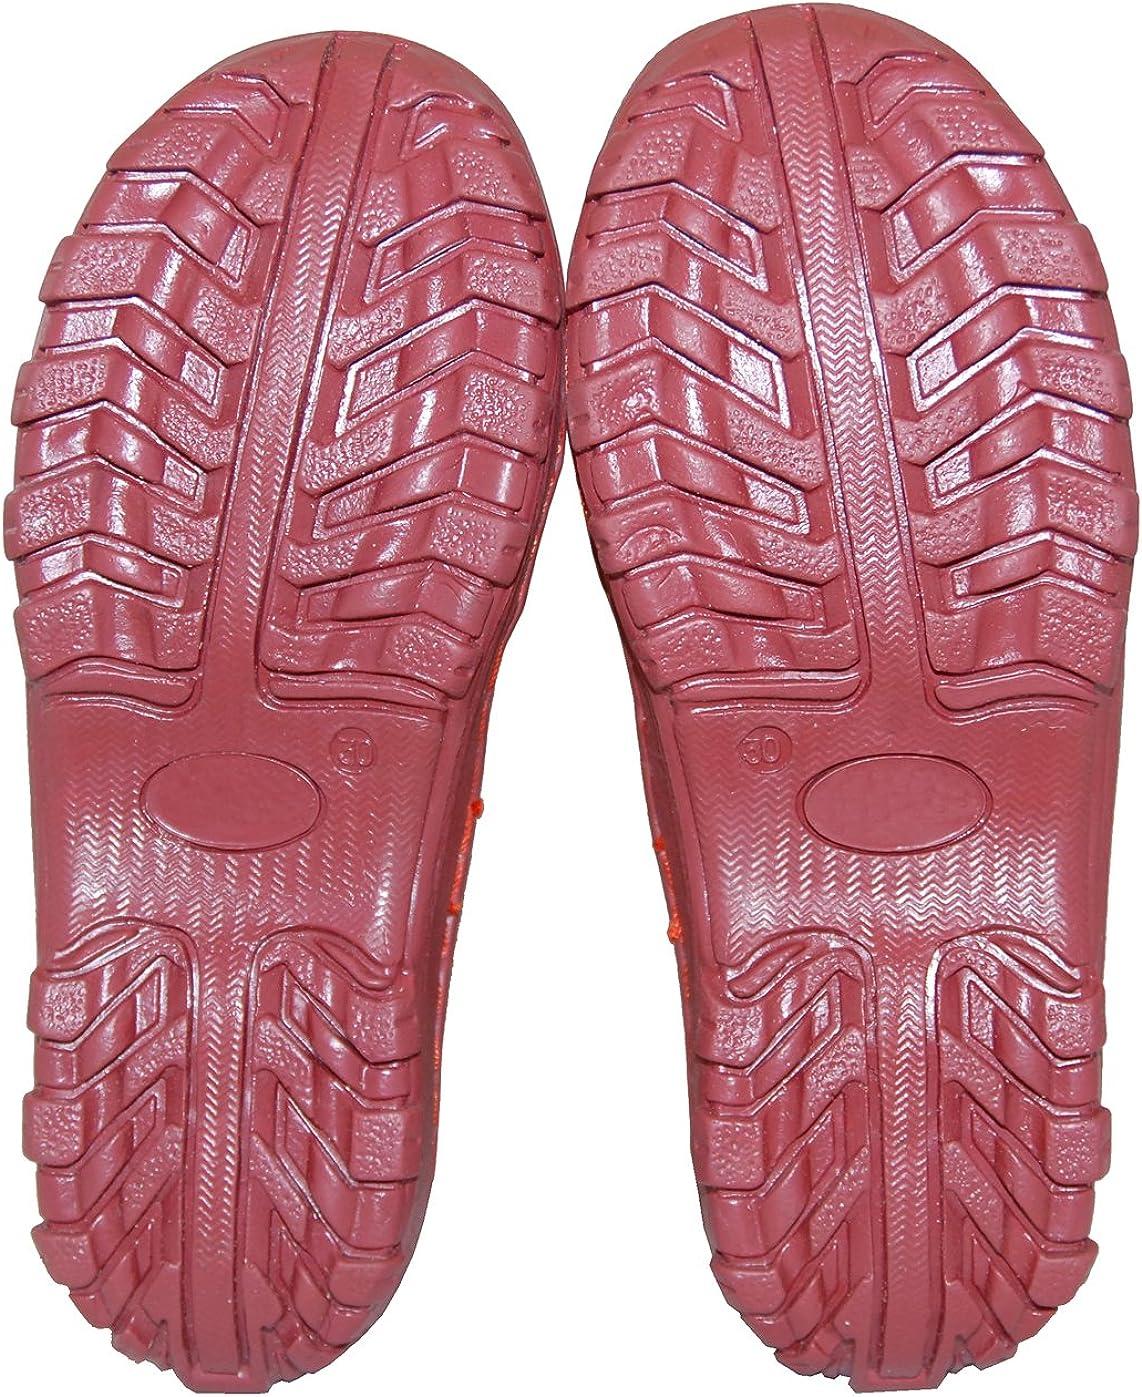 Handmade Valenki Felt Sheepskin Boot Kids 13 Size